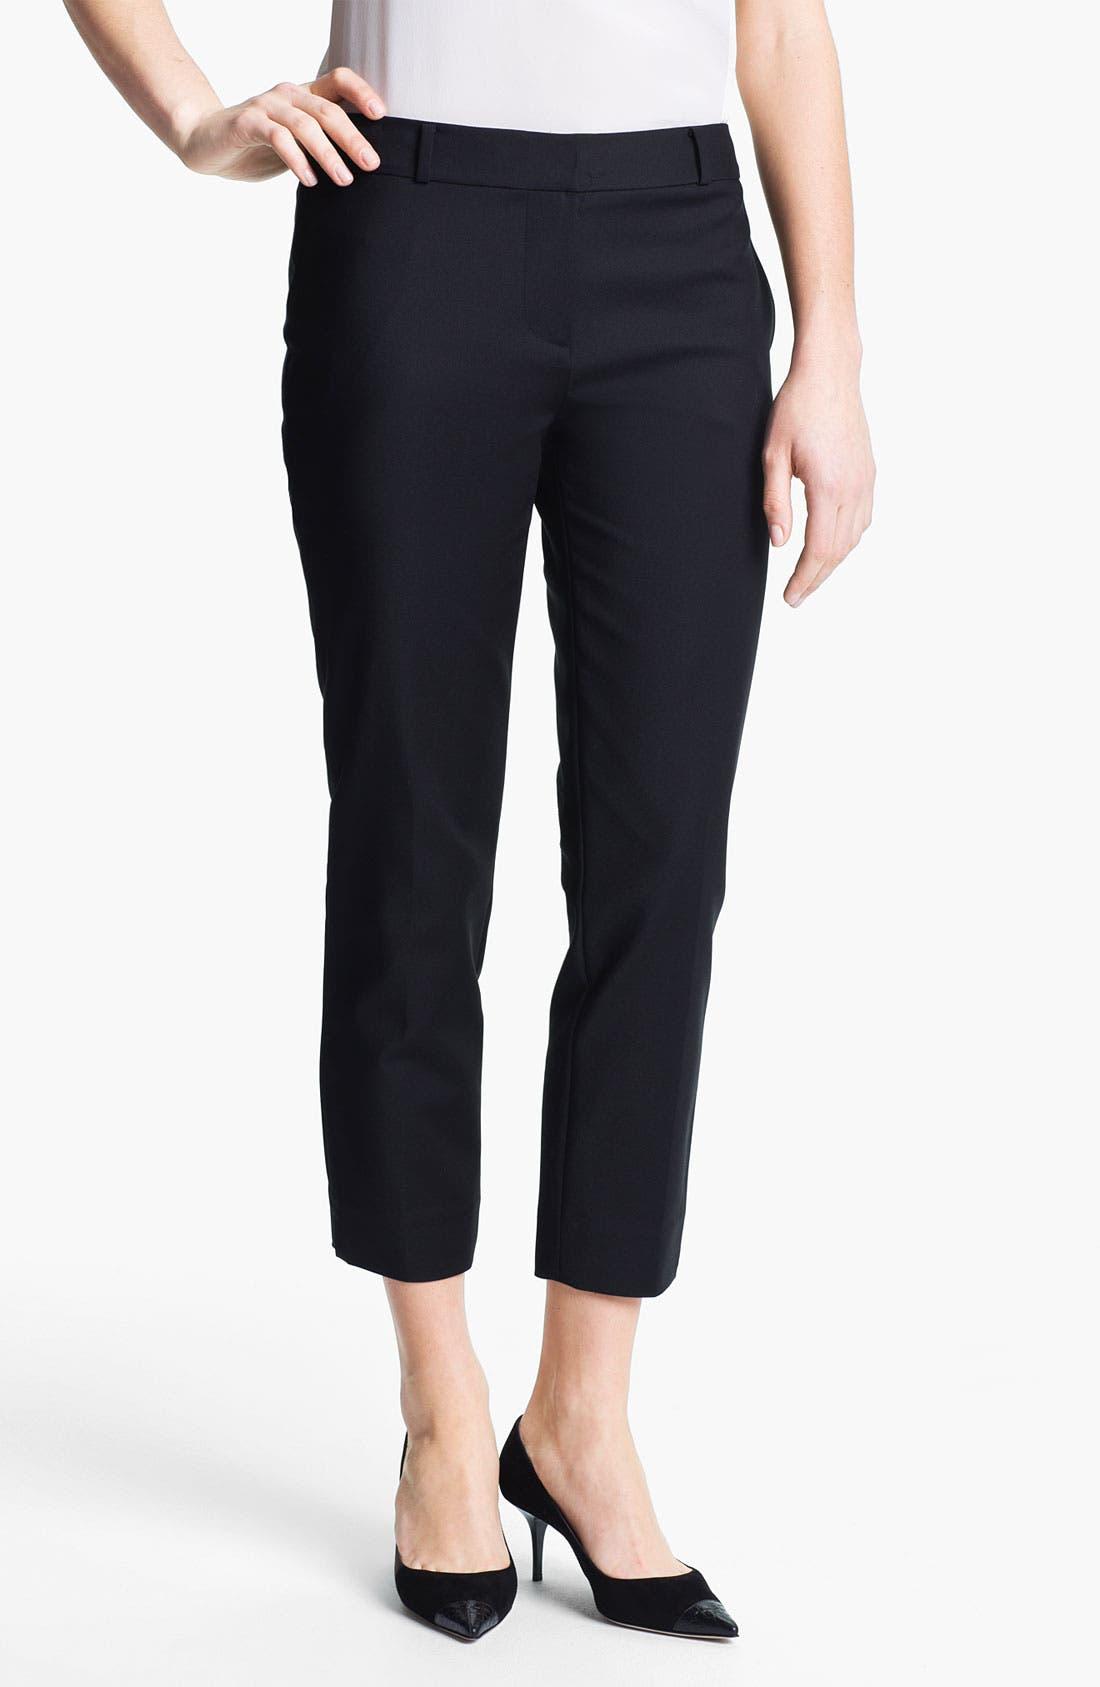 Alternate Image 1 Selected - kate spade new york 'davis' capri pants